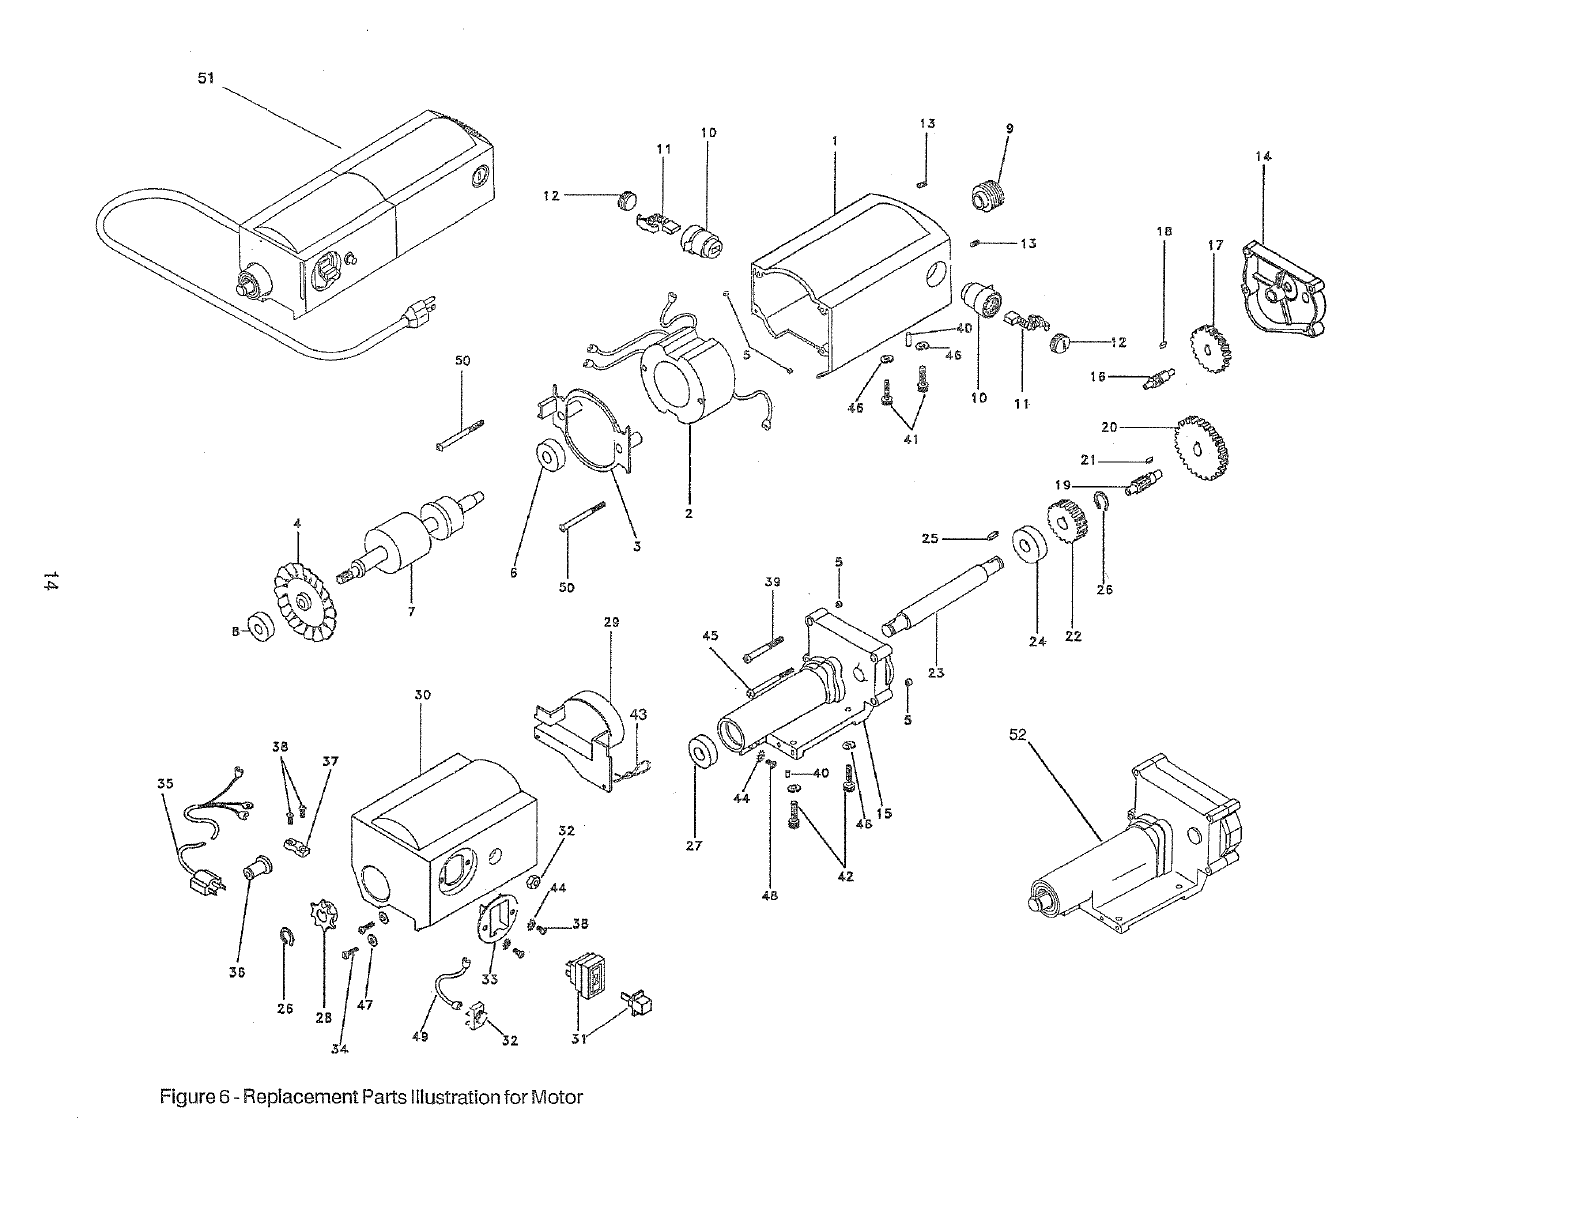 Craftsman 351233731 User Manual PLANER Manuals And Guides